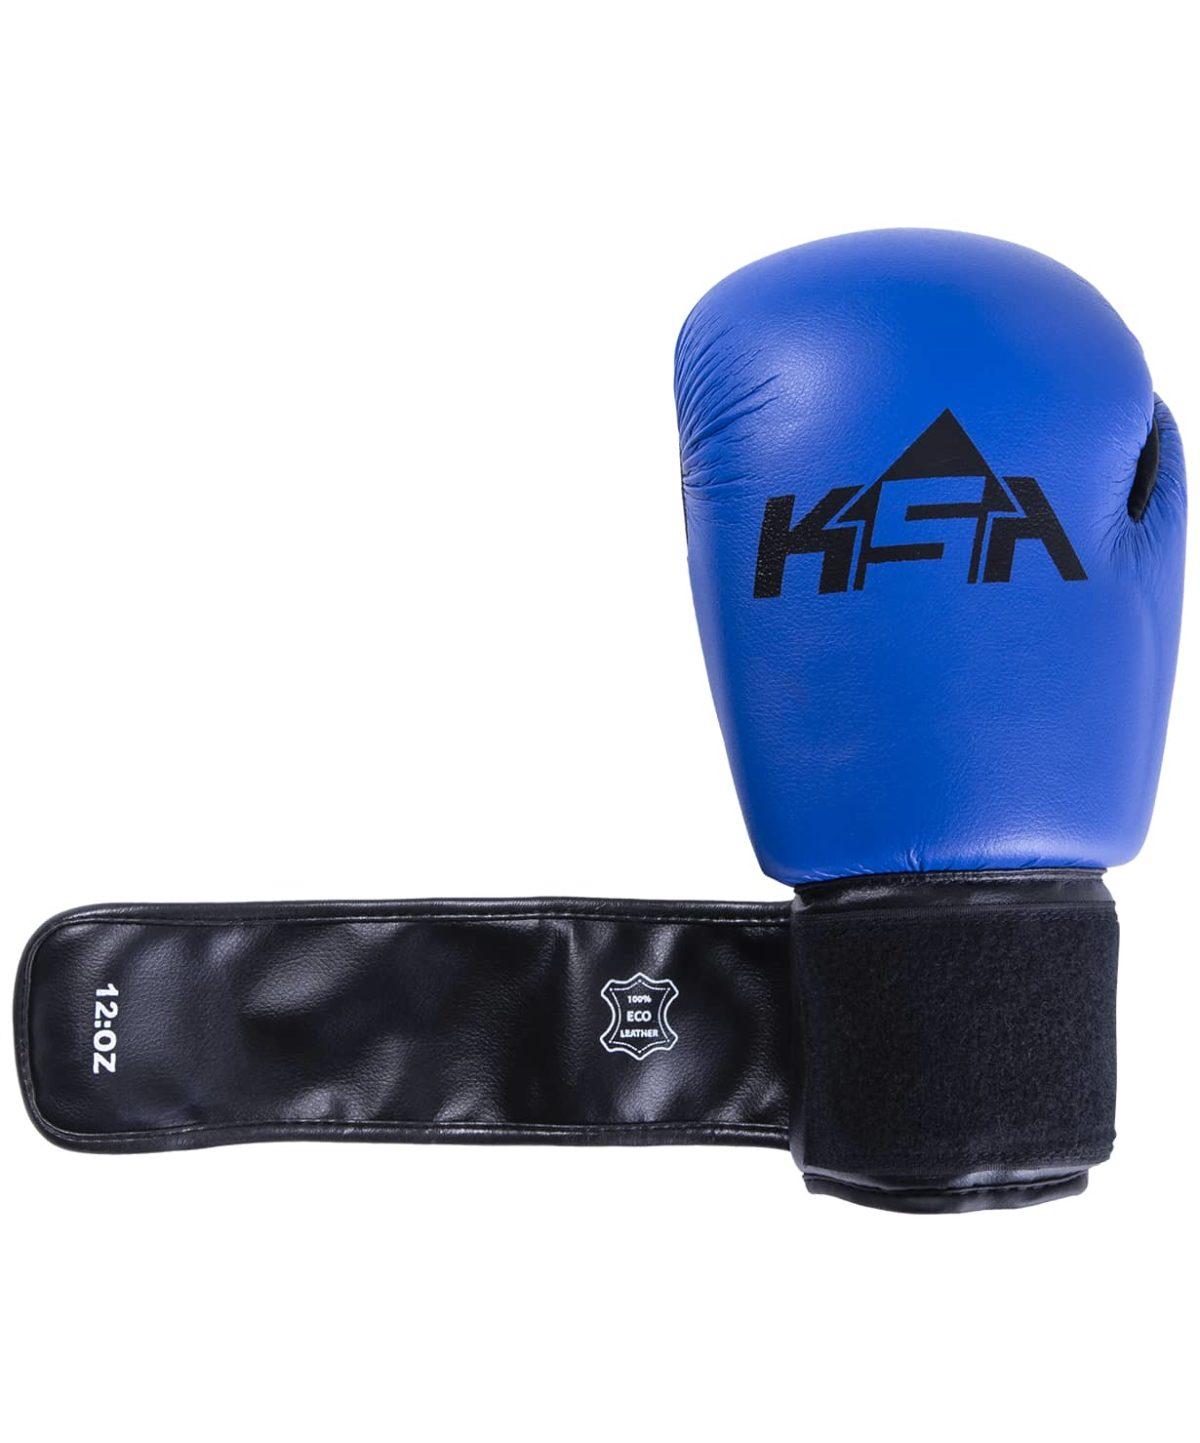 KSA Spider Blue Перчатки боксерские, 4 oz, к/з  17803 - 4